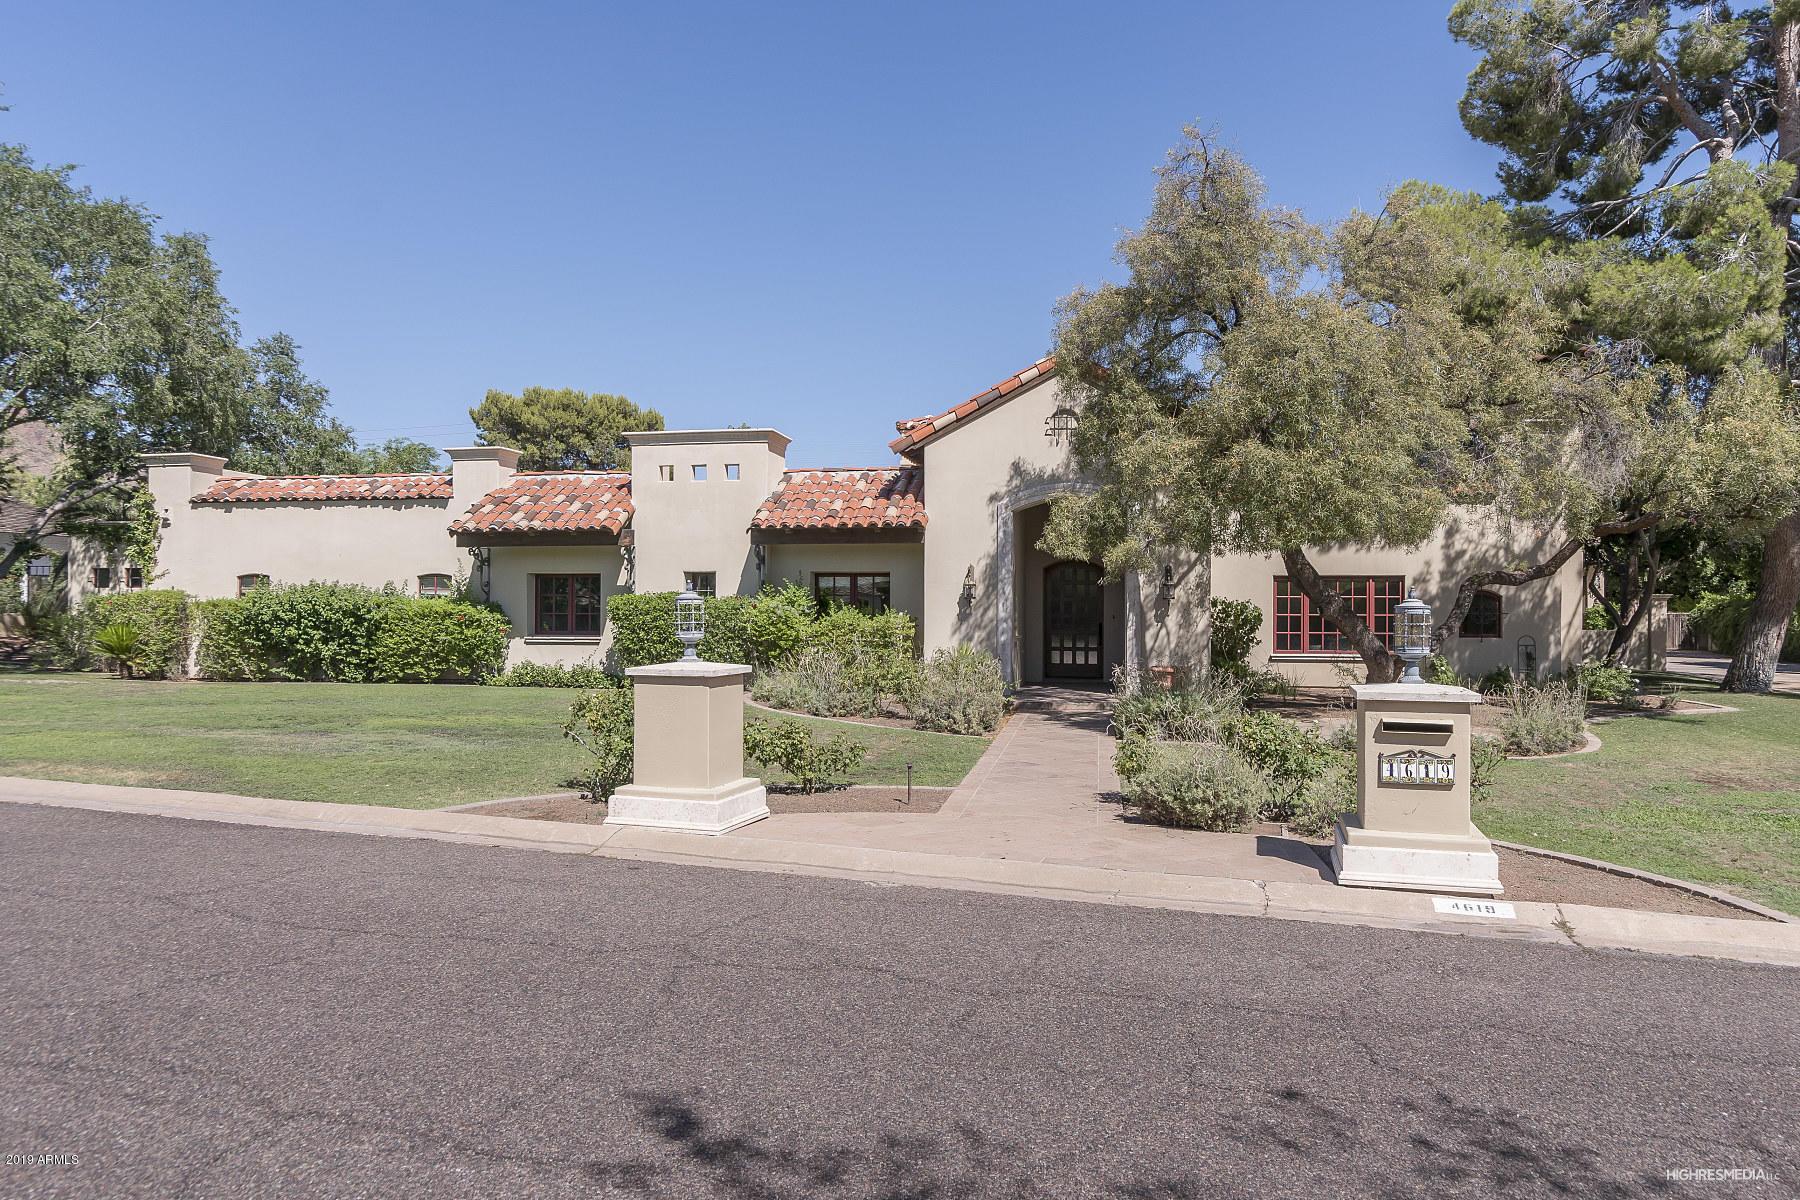 MLS 6000448 4619 N DROMEDARY Road, Phoenix, AZ 85018 Phoenix Homes for Rent